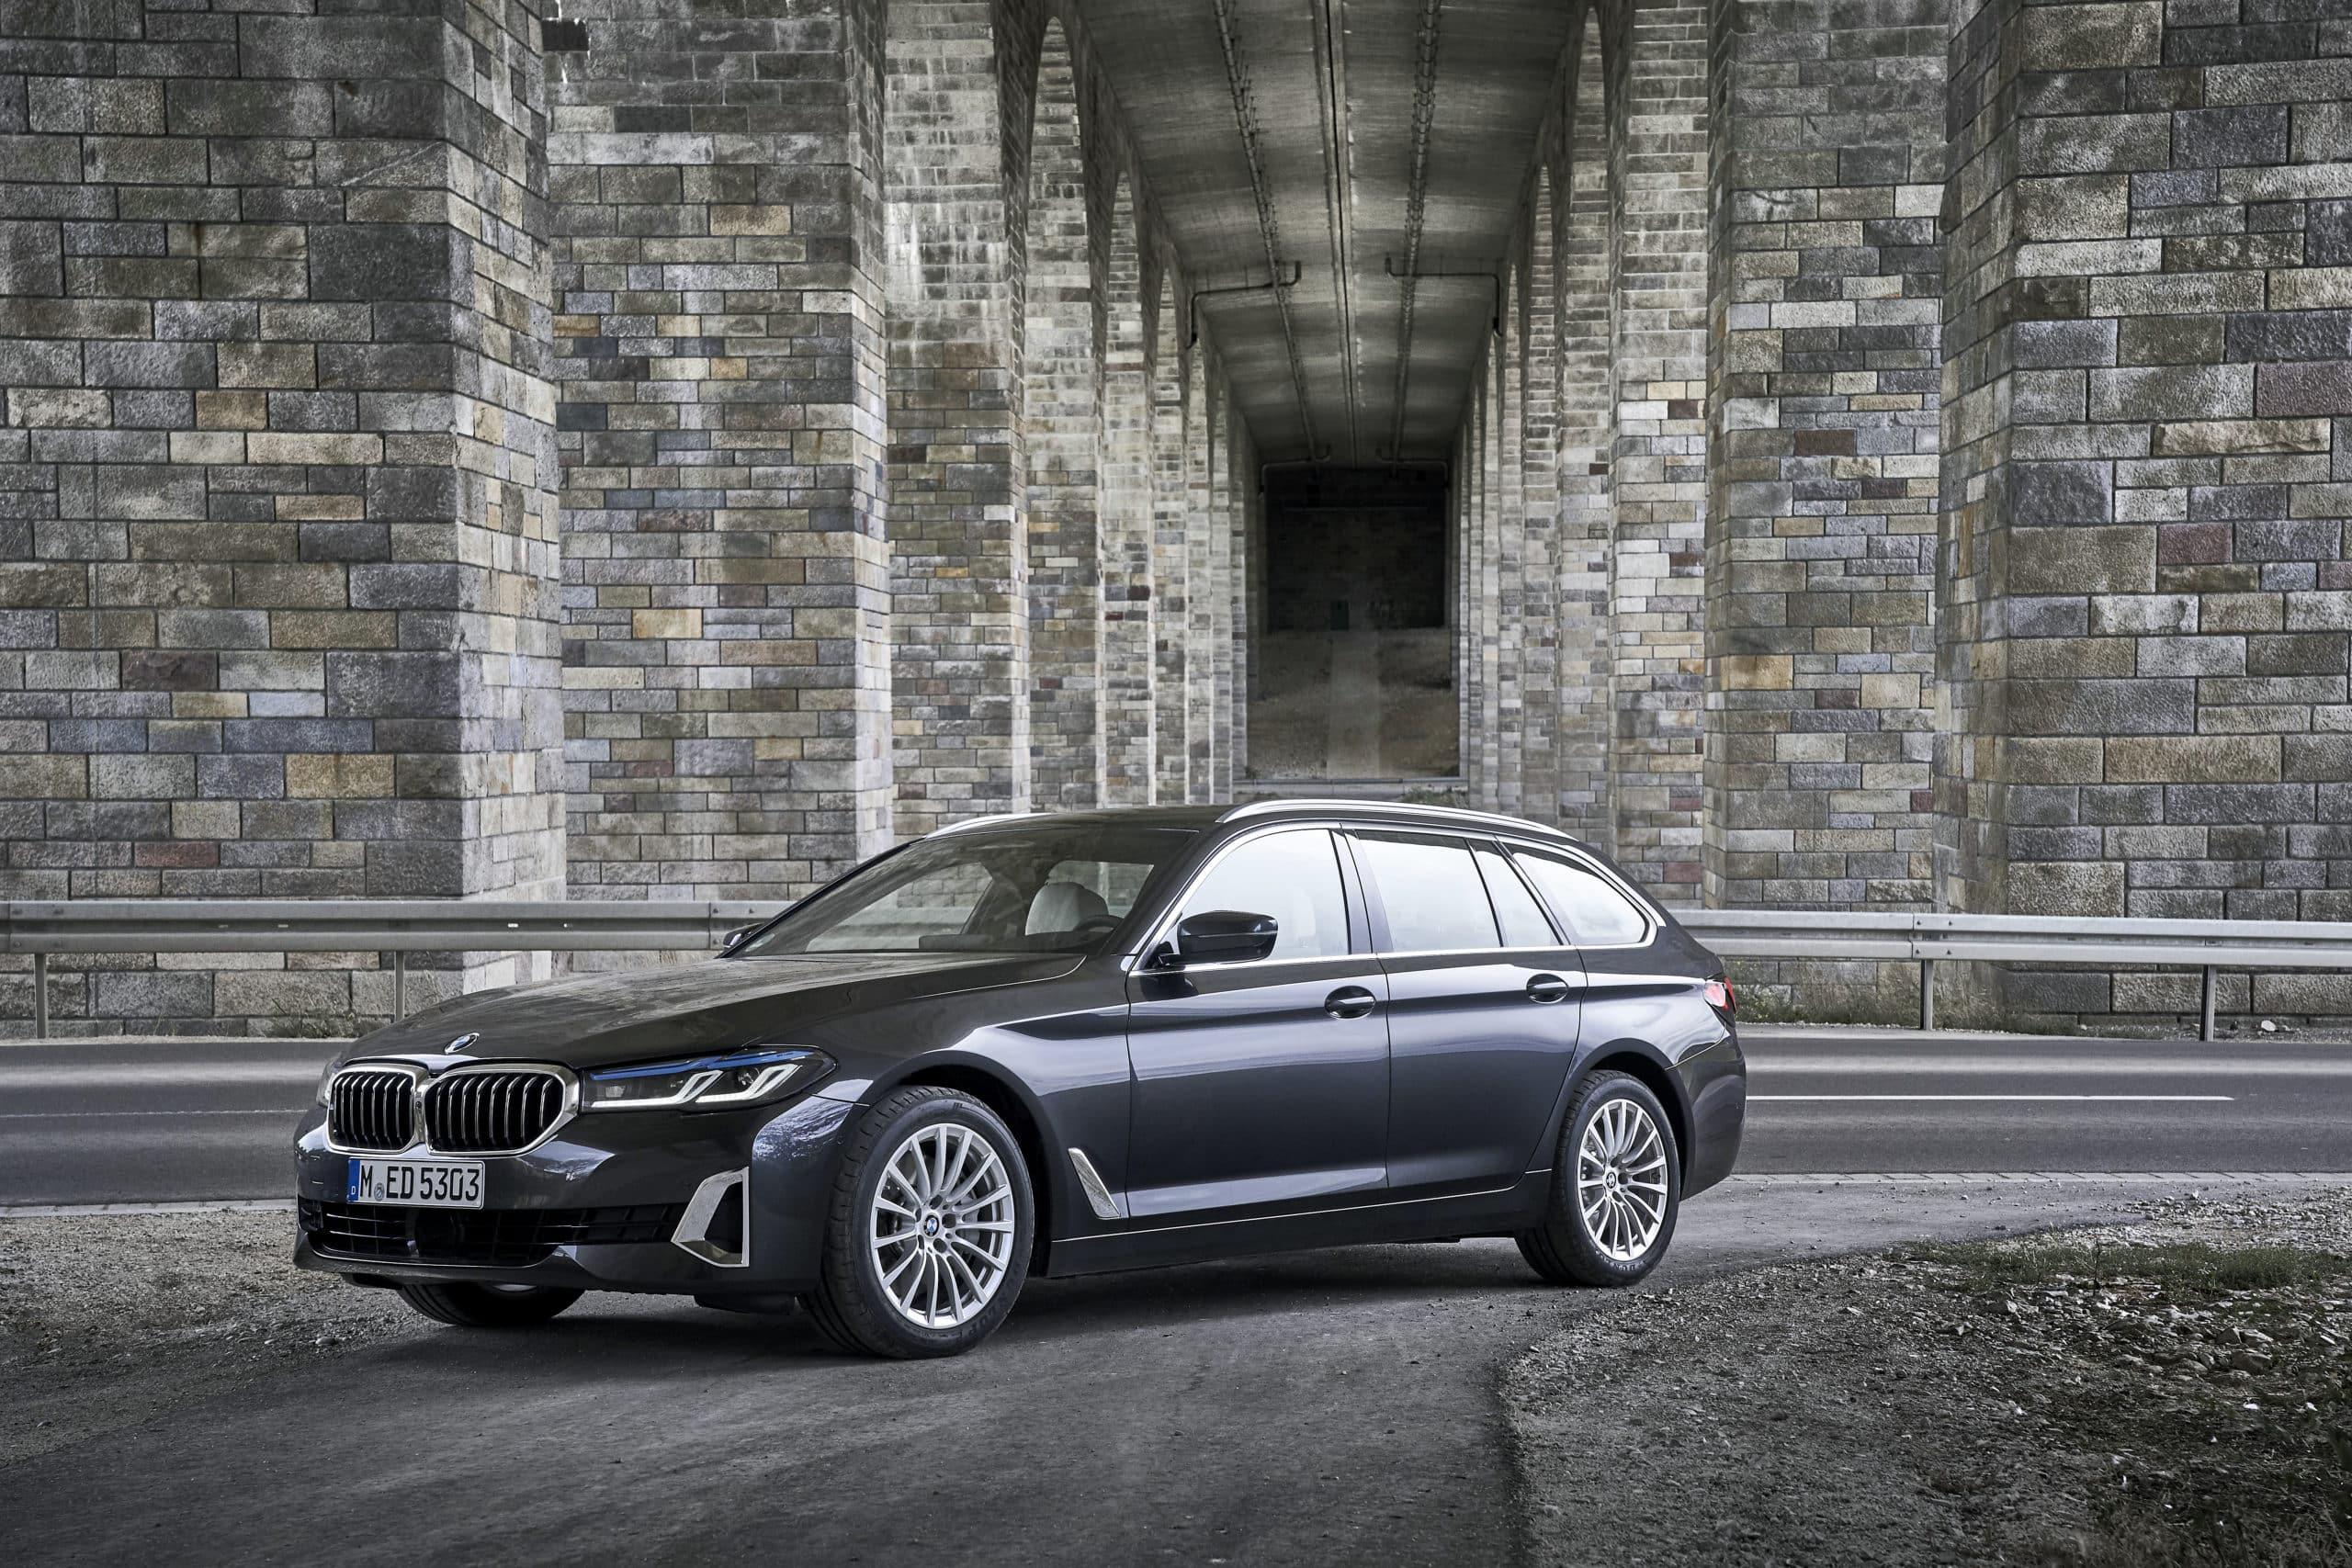 BMW 5er G31